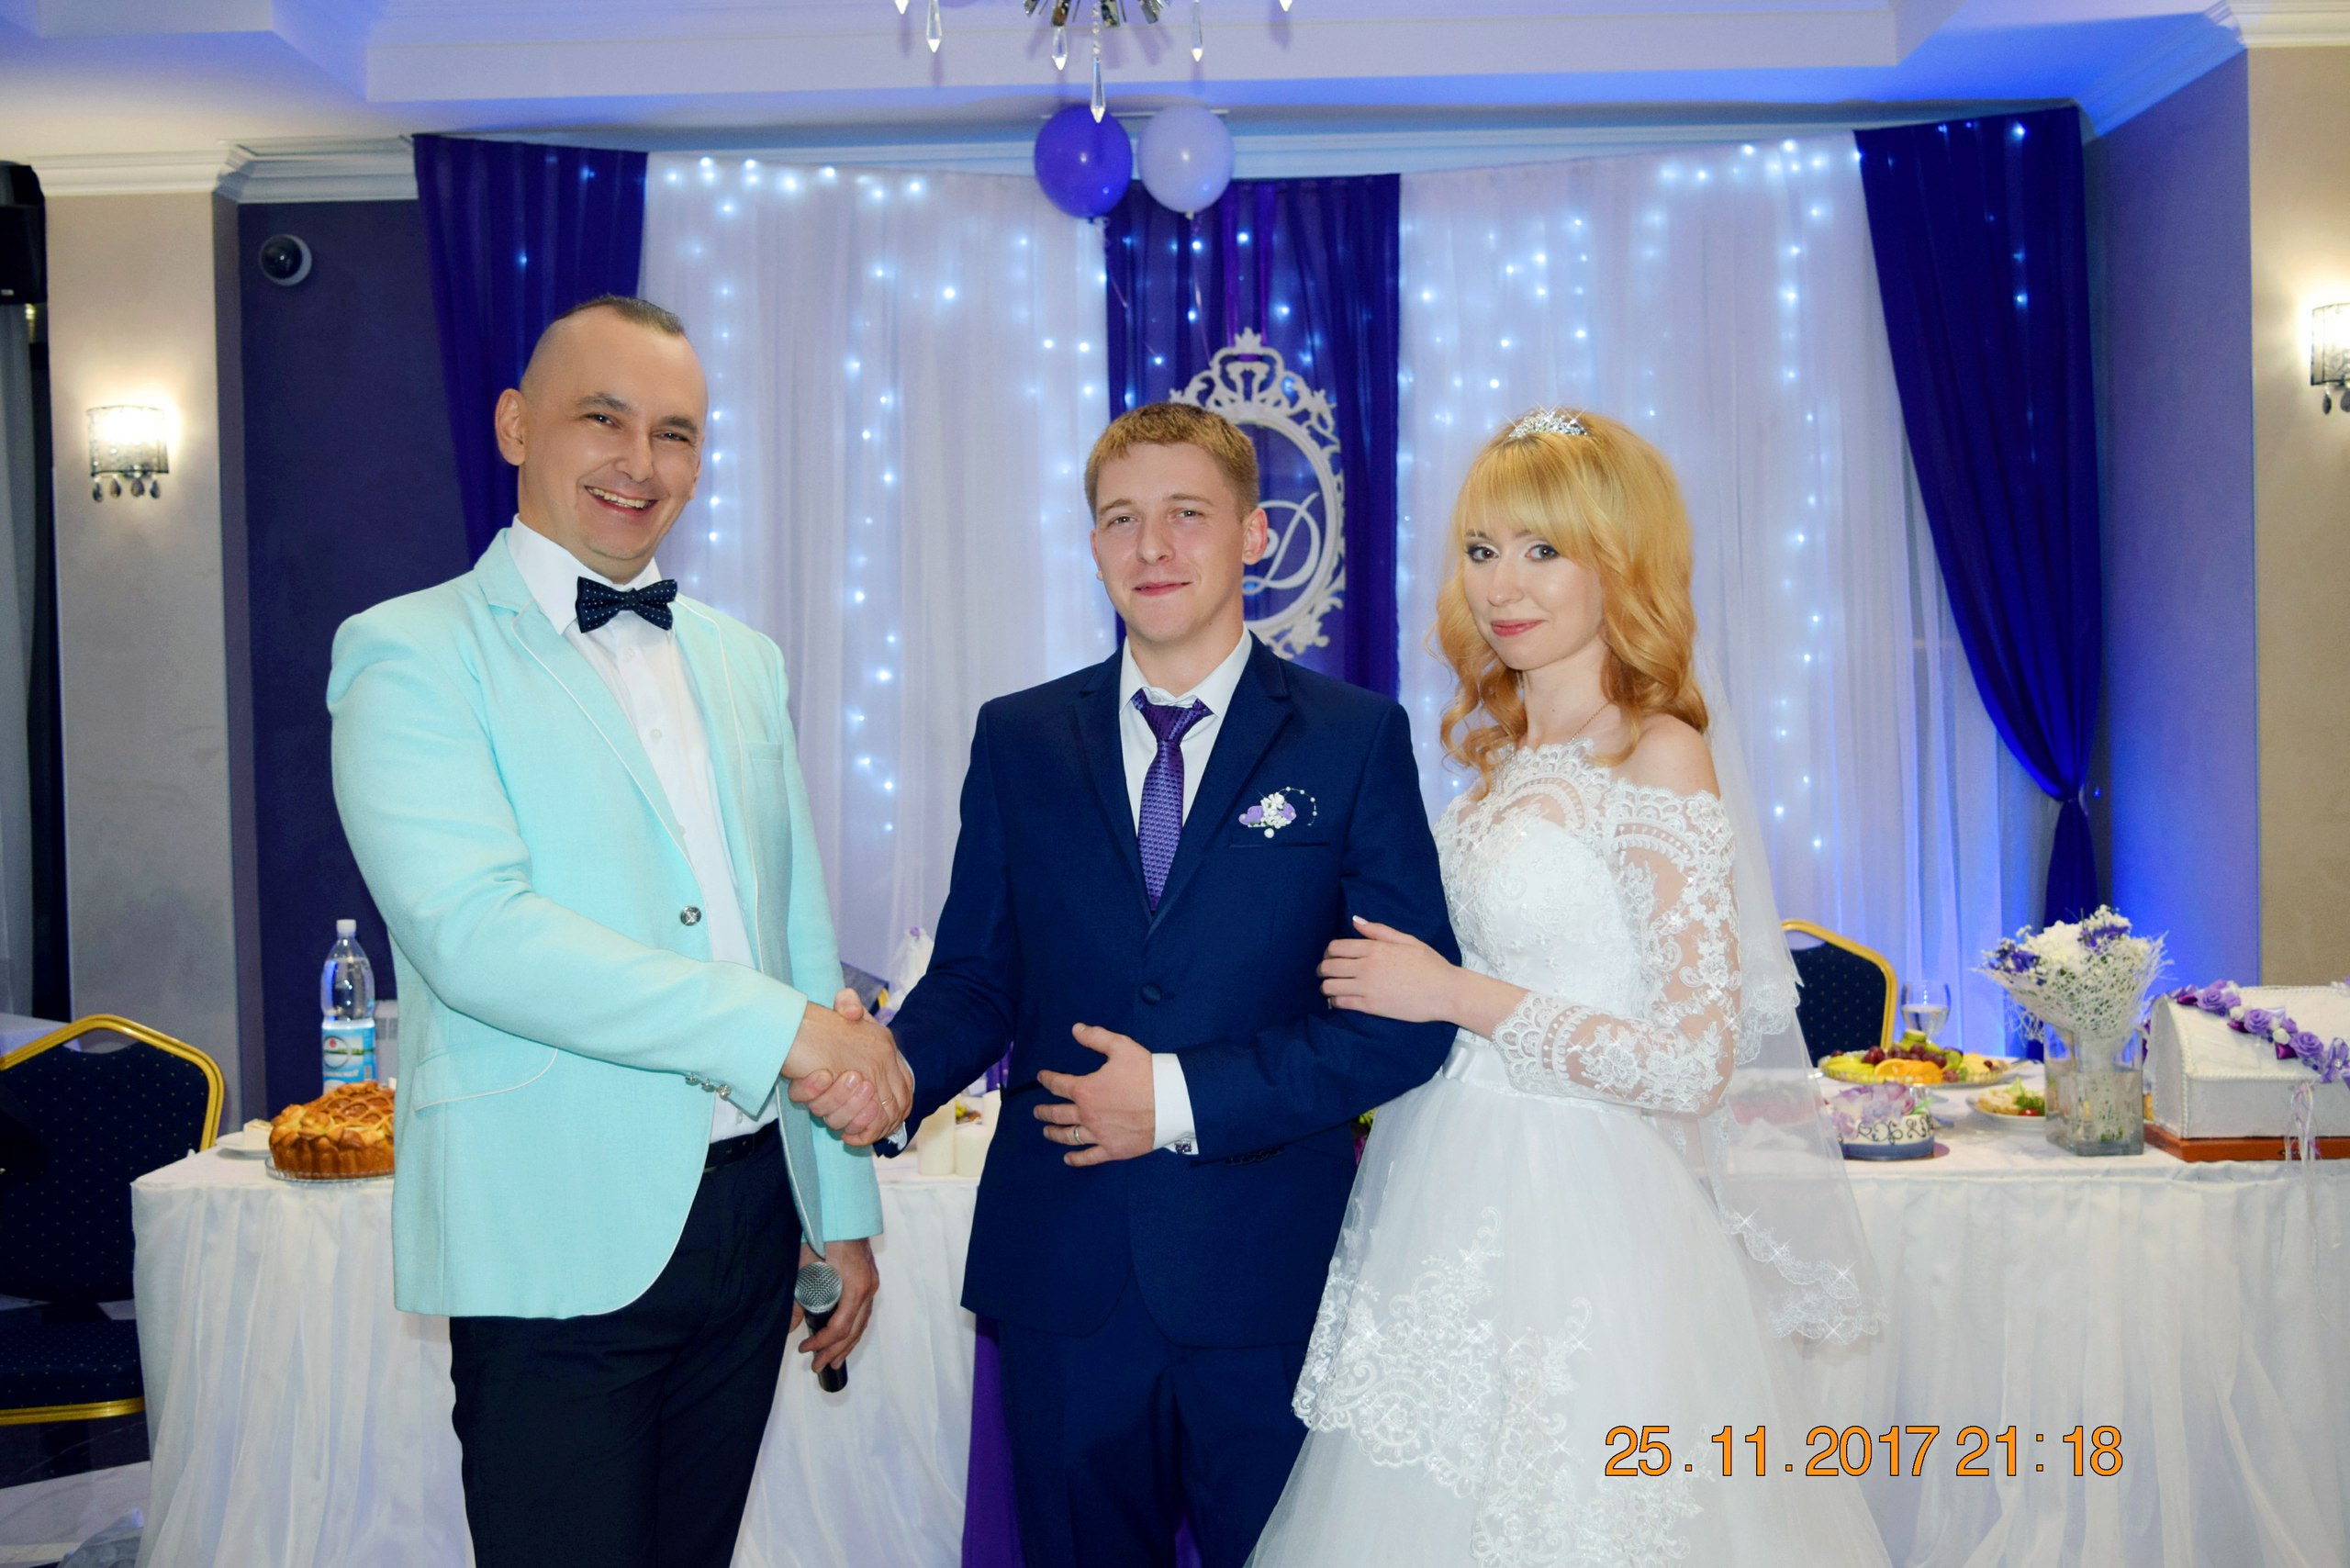 dbqquh6BYkc - Свадьба Дмитрия и Марины